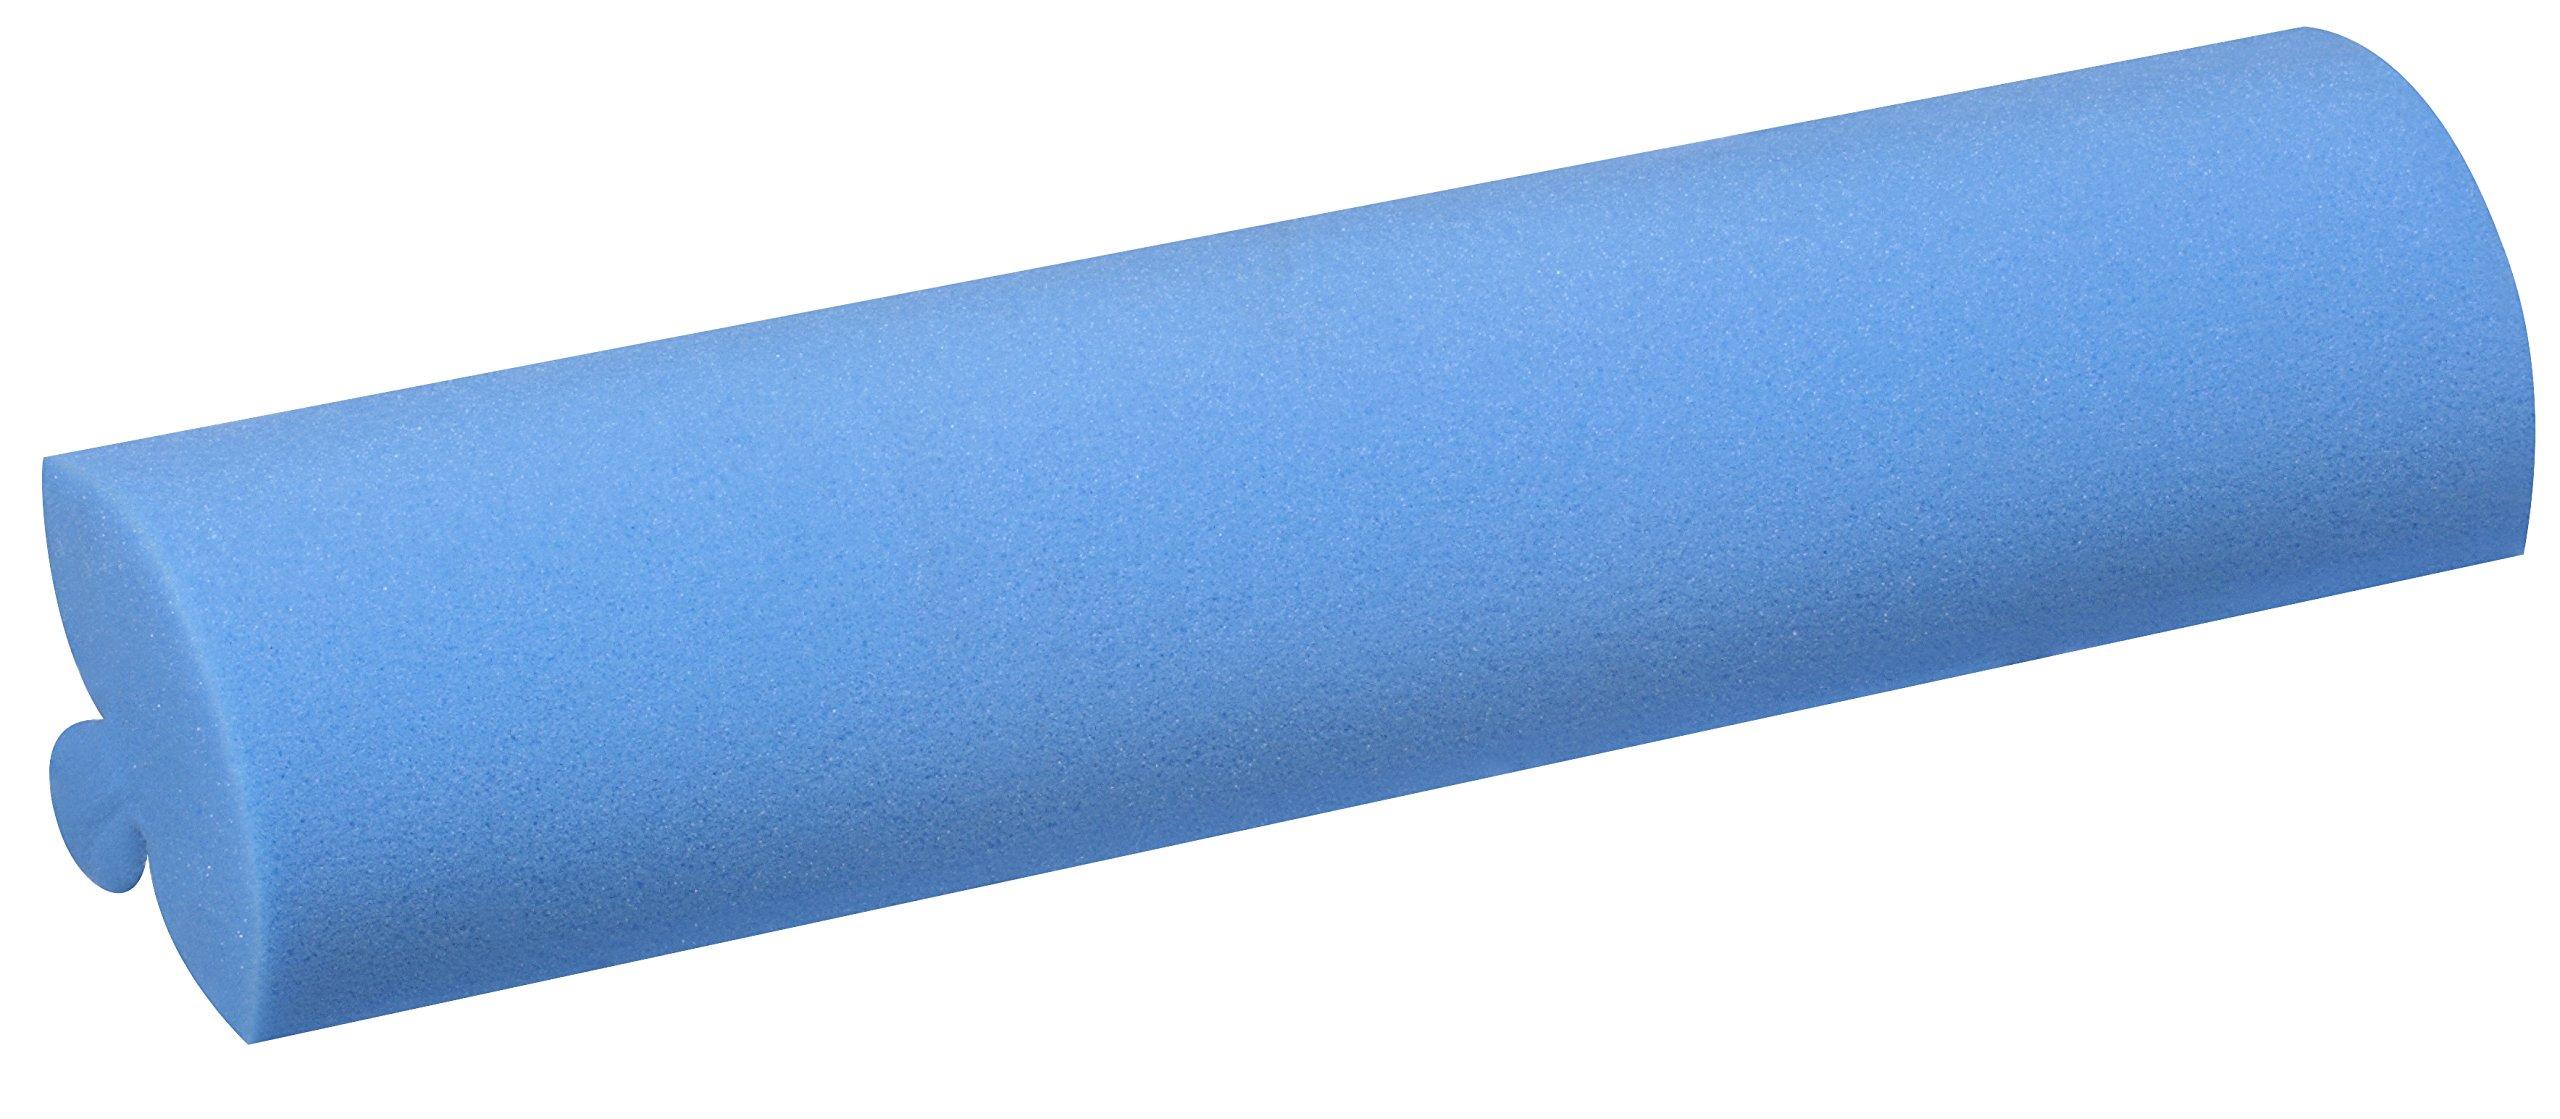 Vileda Professional 14'' Roll-O-Matic Original Stainless Steel Sponge Refill